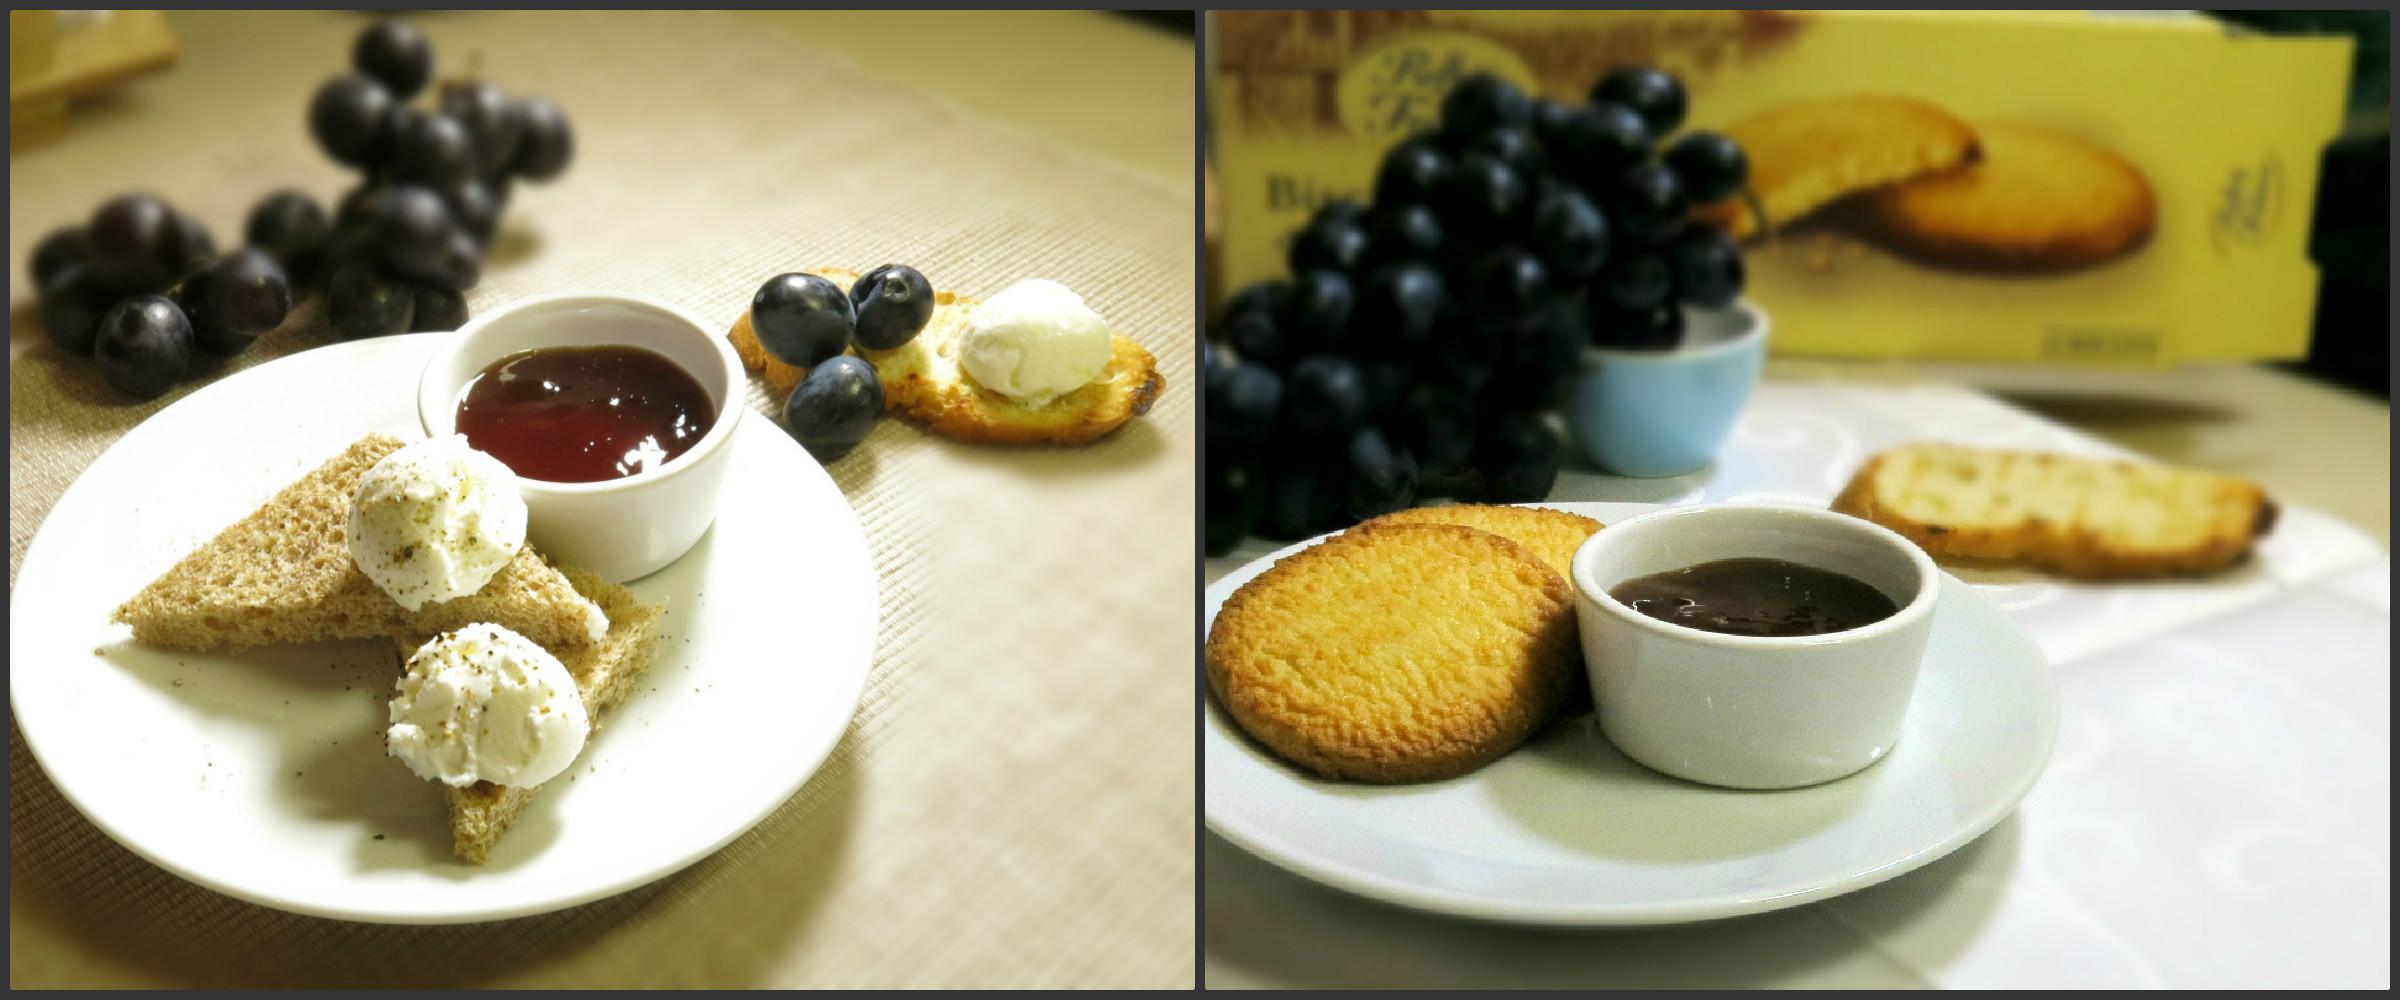 gelatina di uva nera tardiva